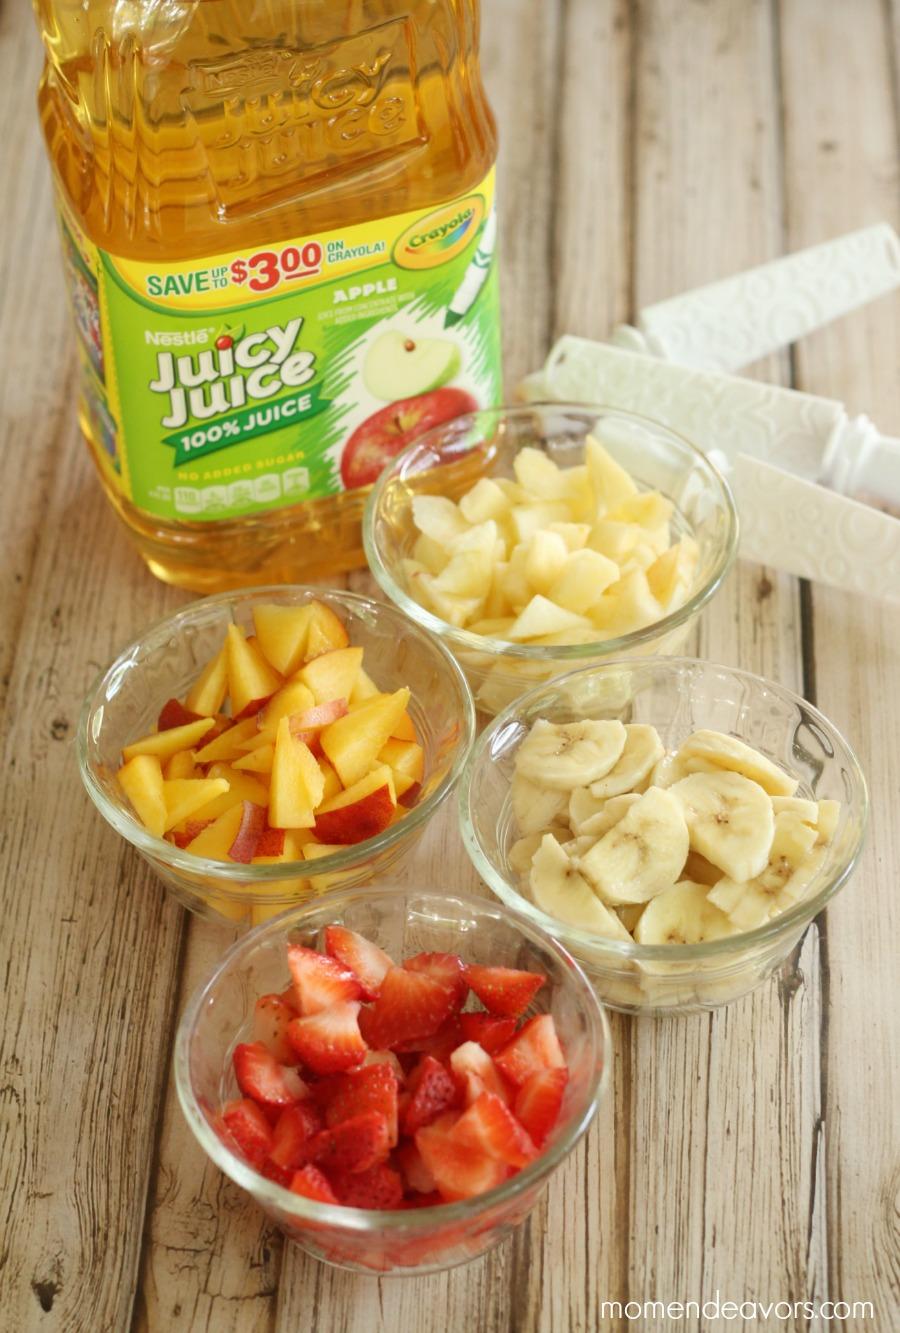 Juicy Juice Fruit Popsicle Bar